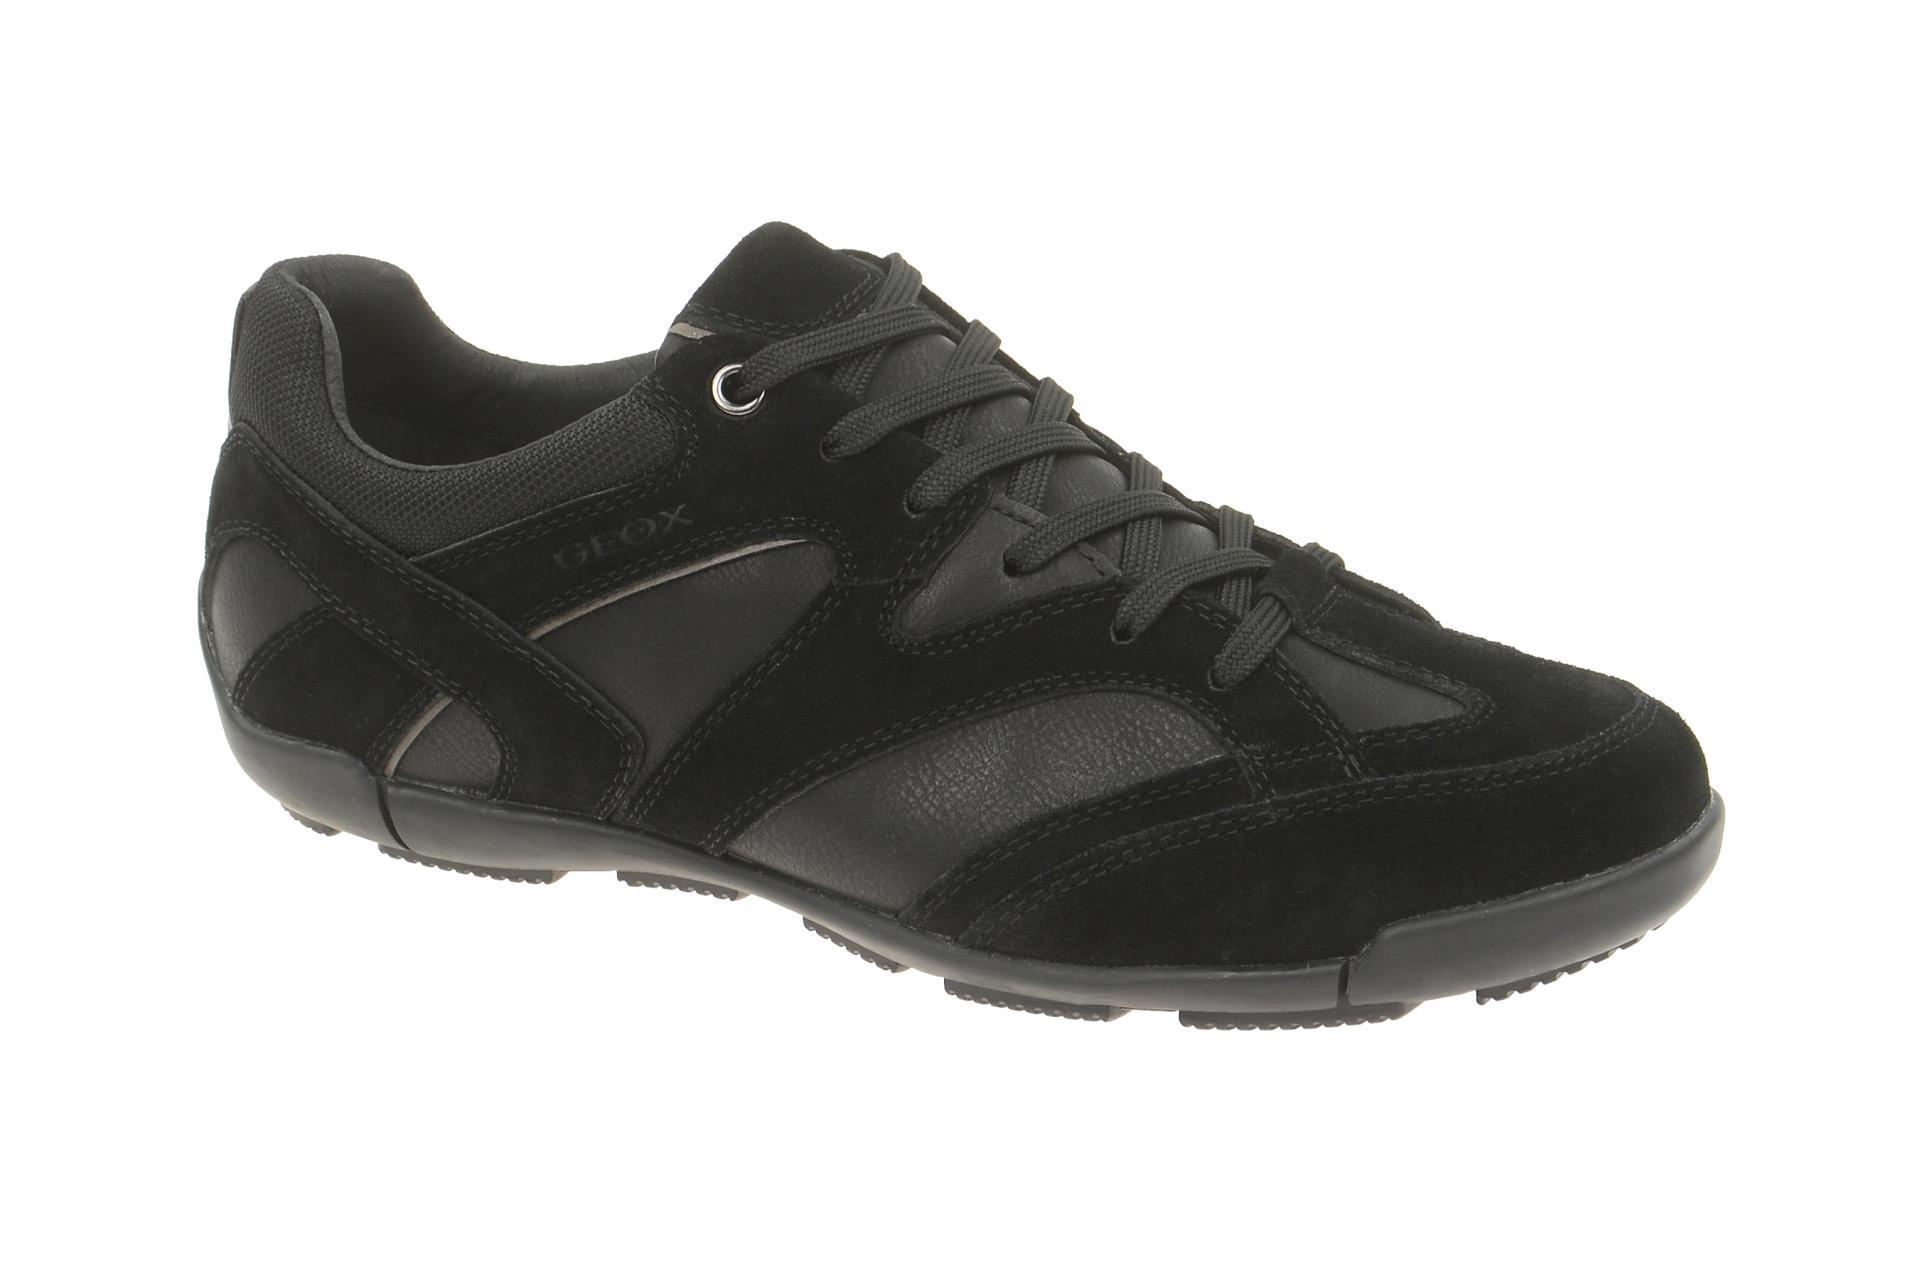 newest c4cce a71b9 Details zu Geox Schuhe CART schwarz Herrenschuhe sportliche Halbschuhe  U34S4T 0ME22 C9999